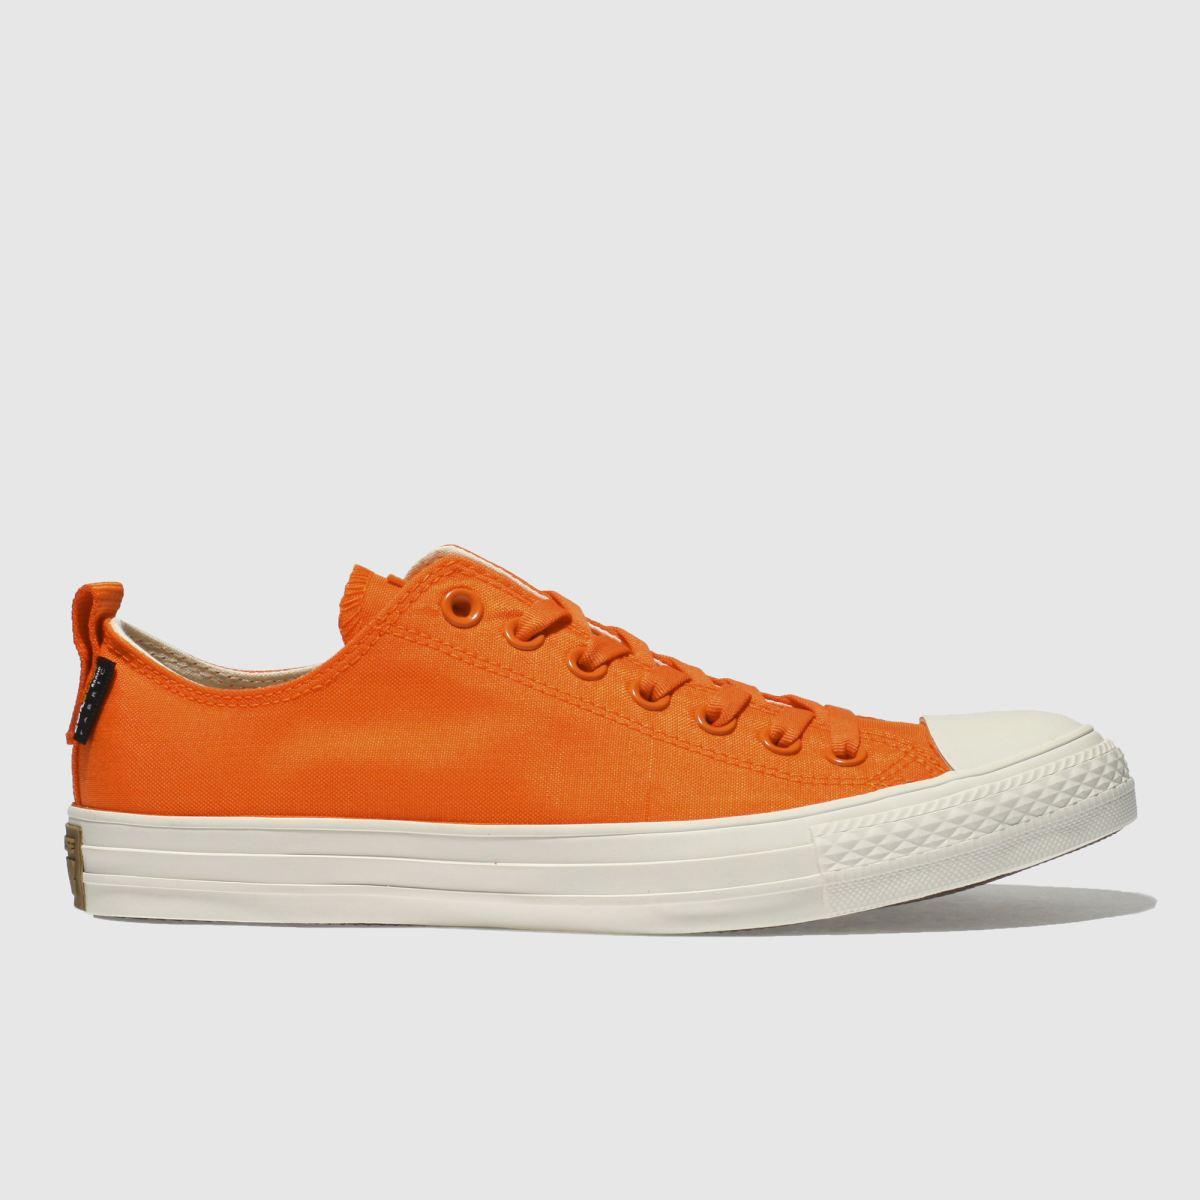 Converse Orange All Star Ox Cordura Trainers